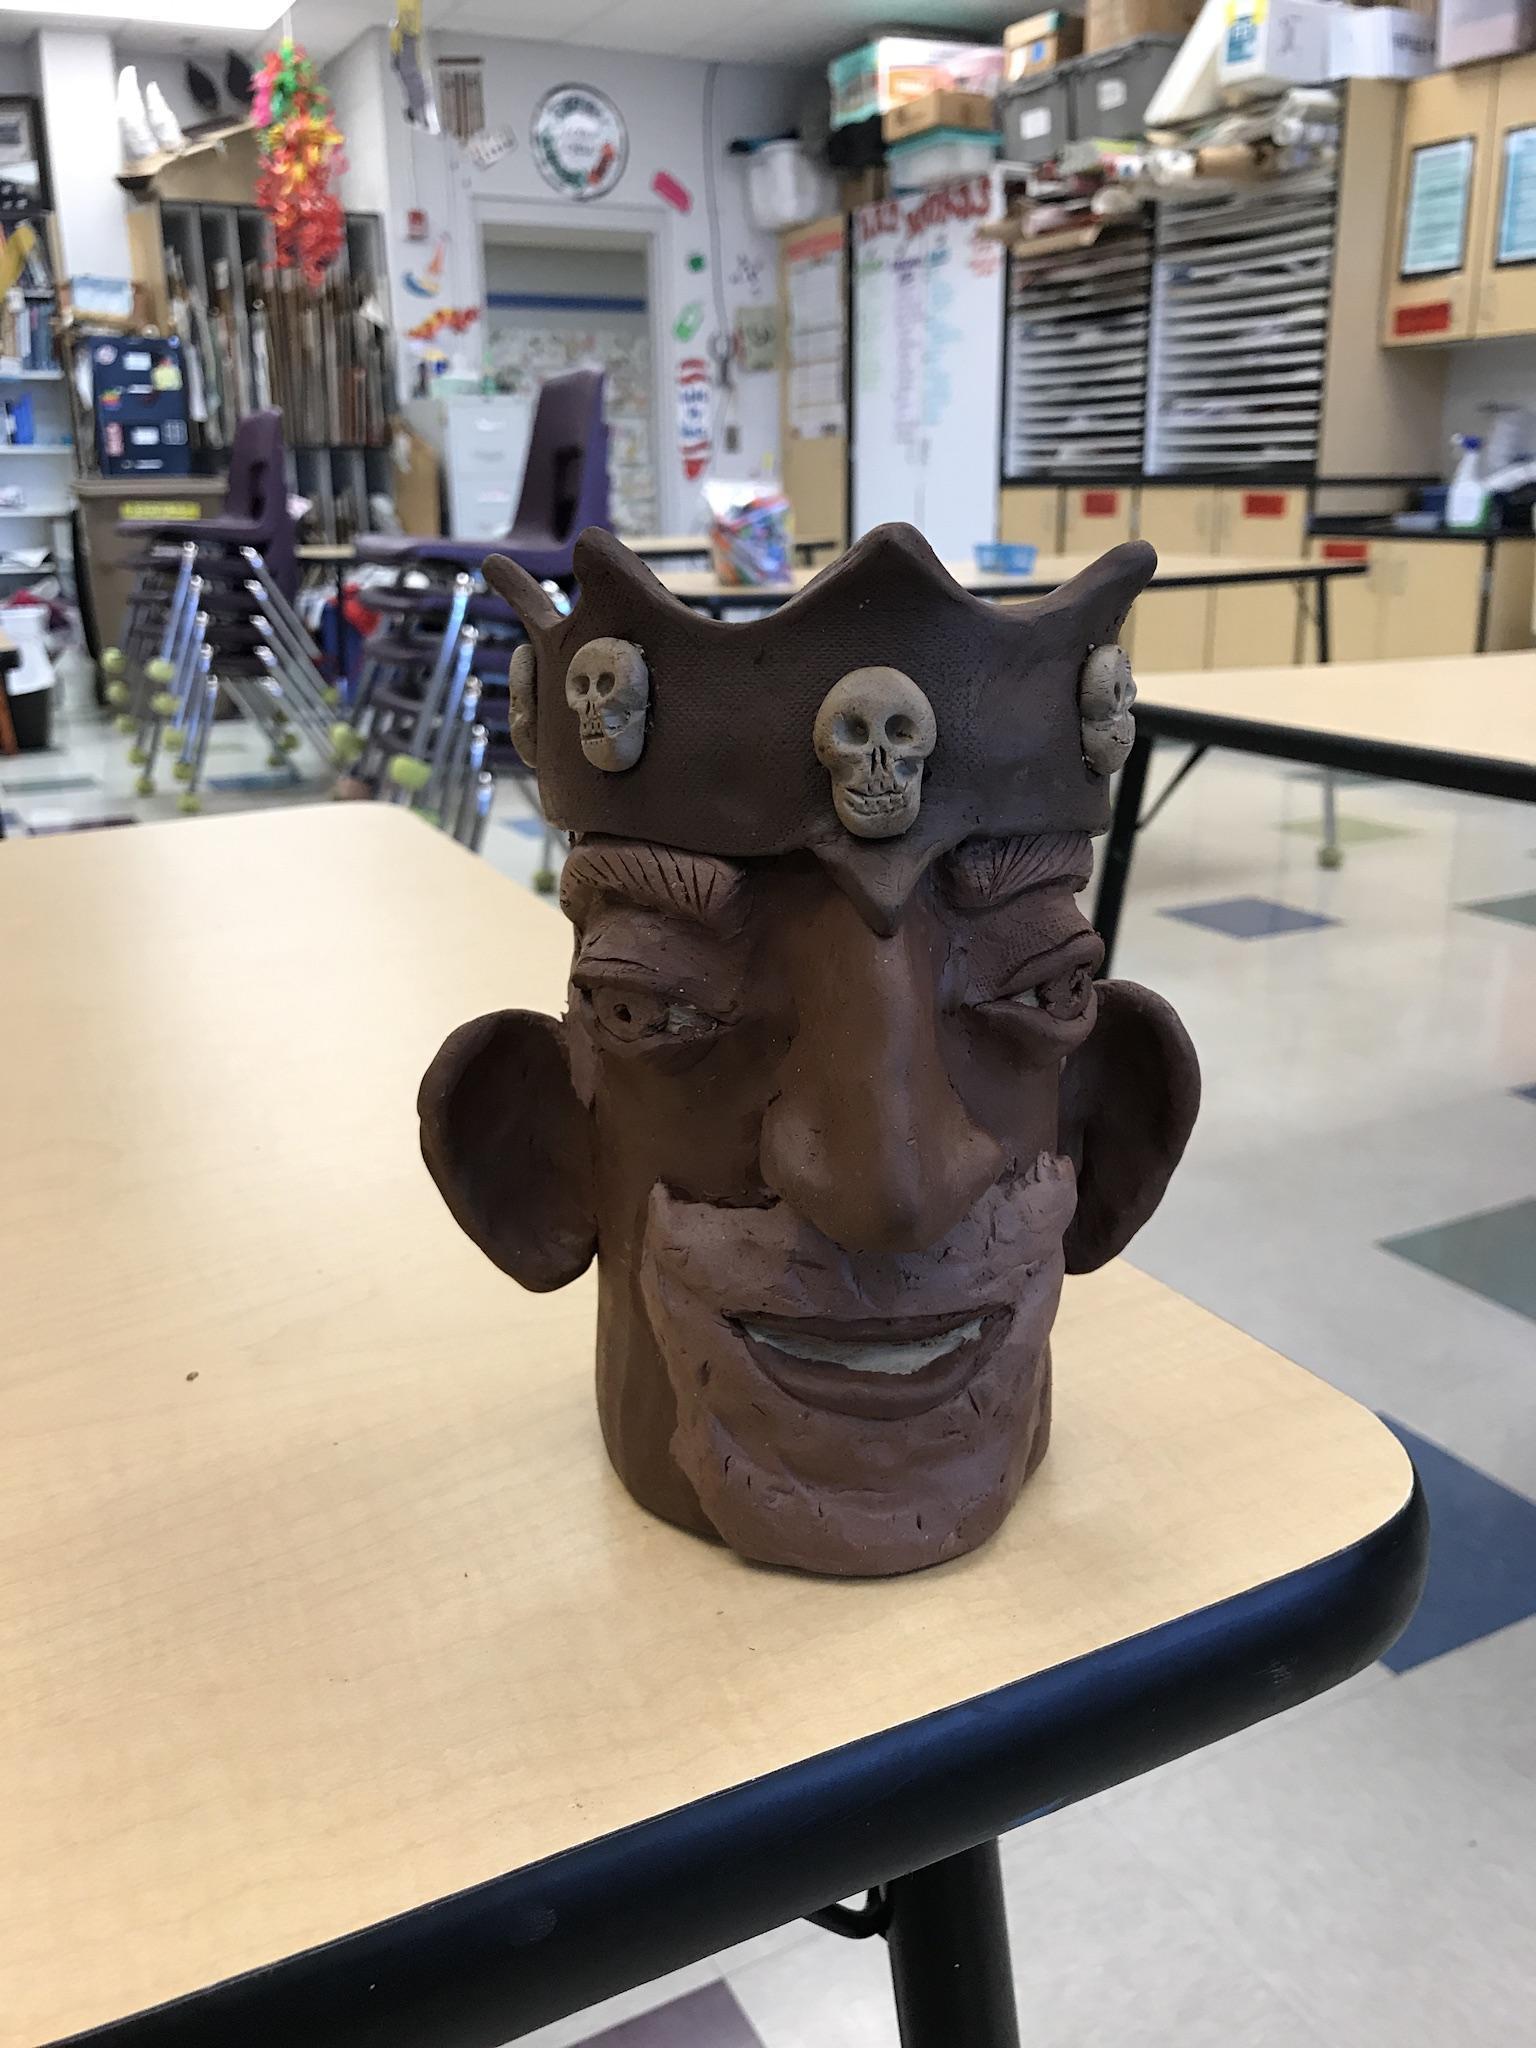 A Pirate King Ugly Mug!